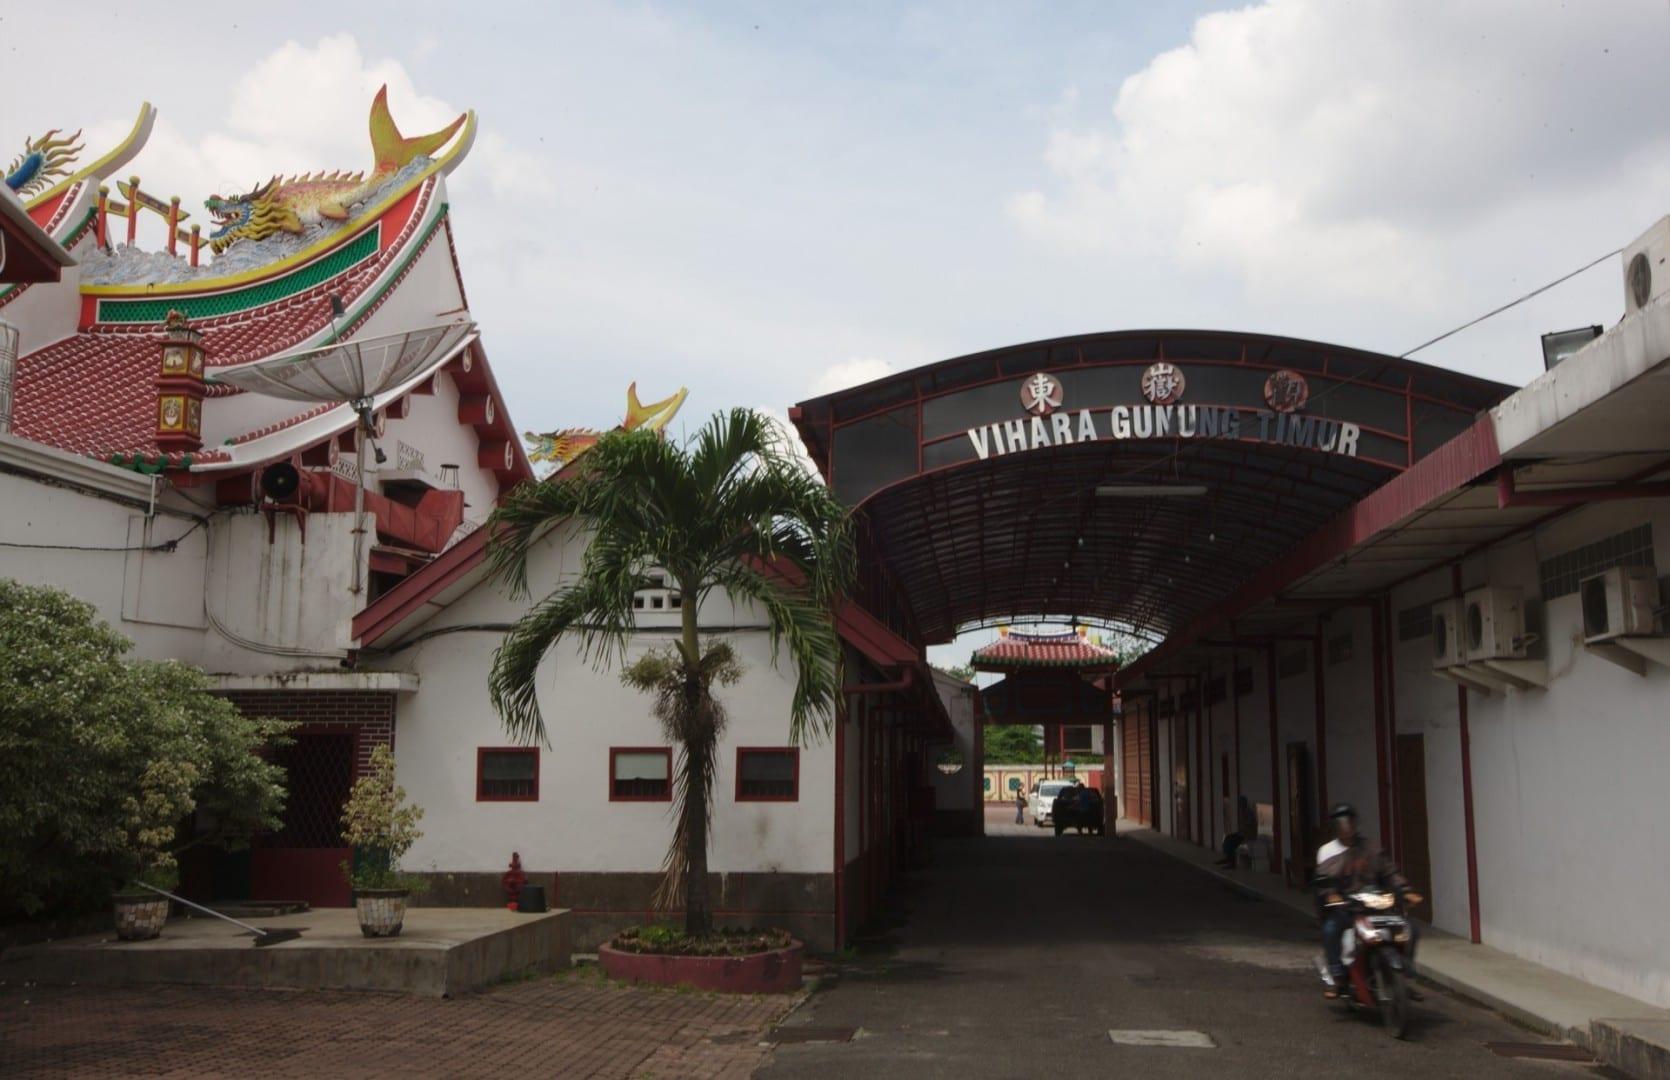 Entrada al templo daoísta chino de Vihara Gunung Timur. Medan Indonesia